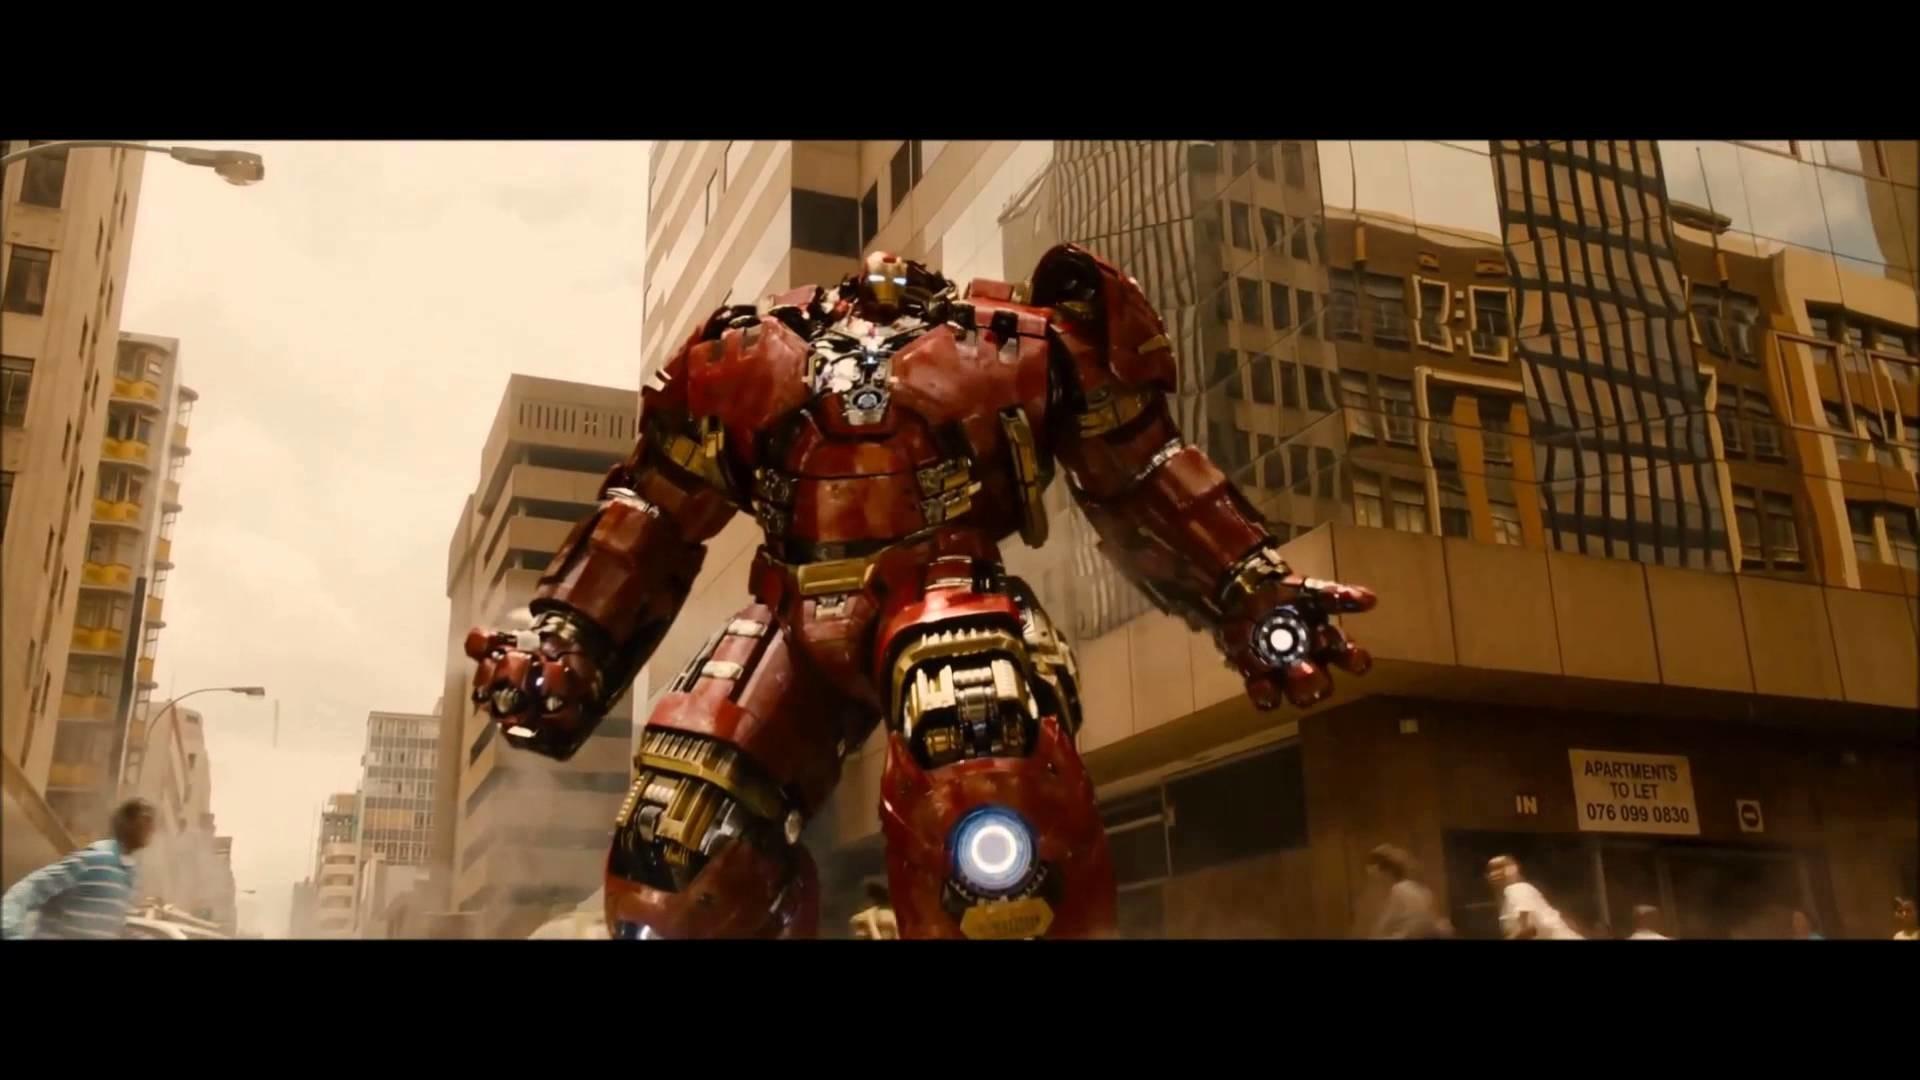 The Avengers Age Of Ultron : HulkBuster Vs The Hulk